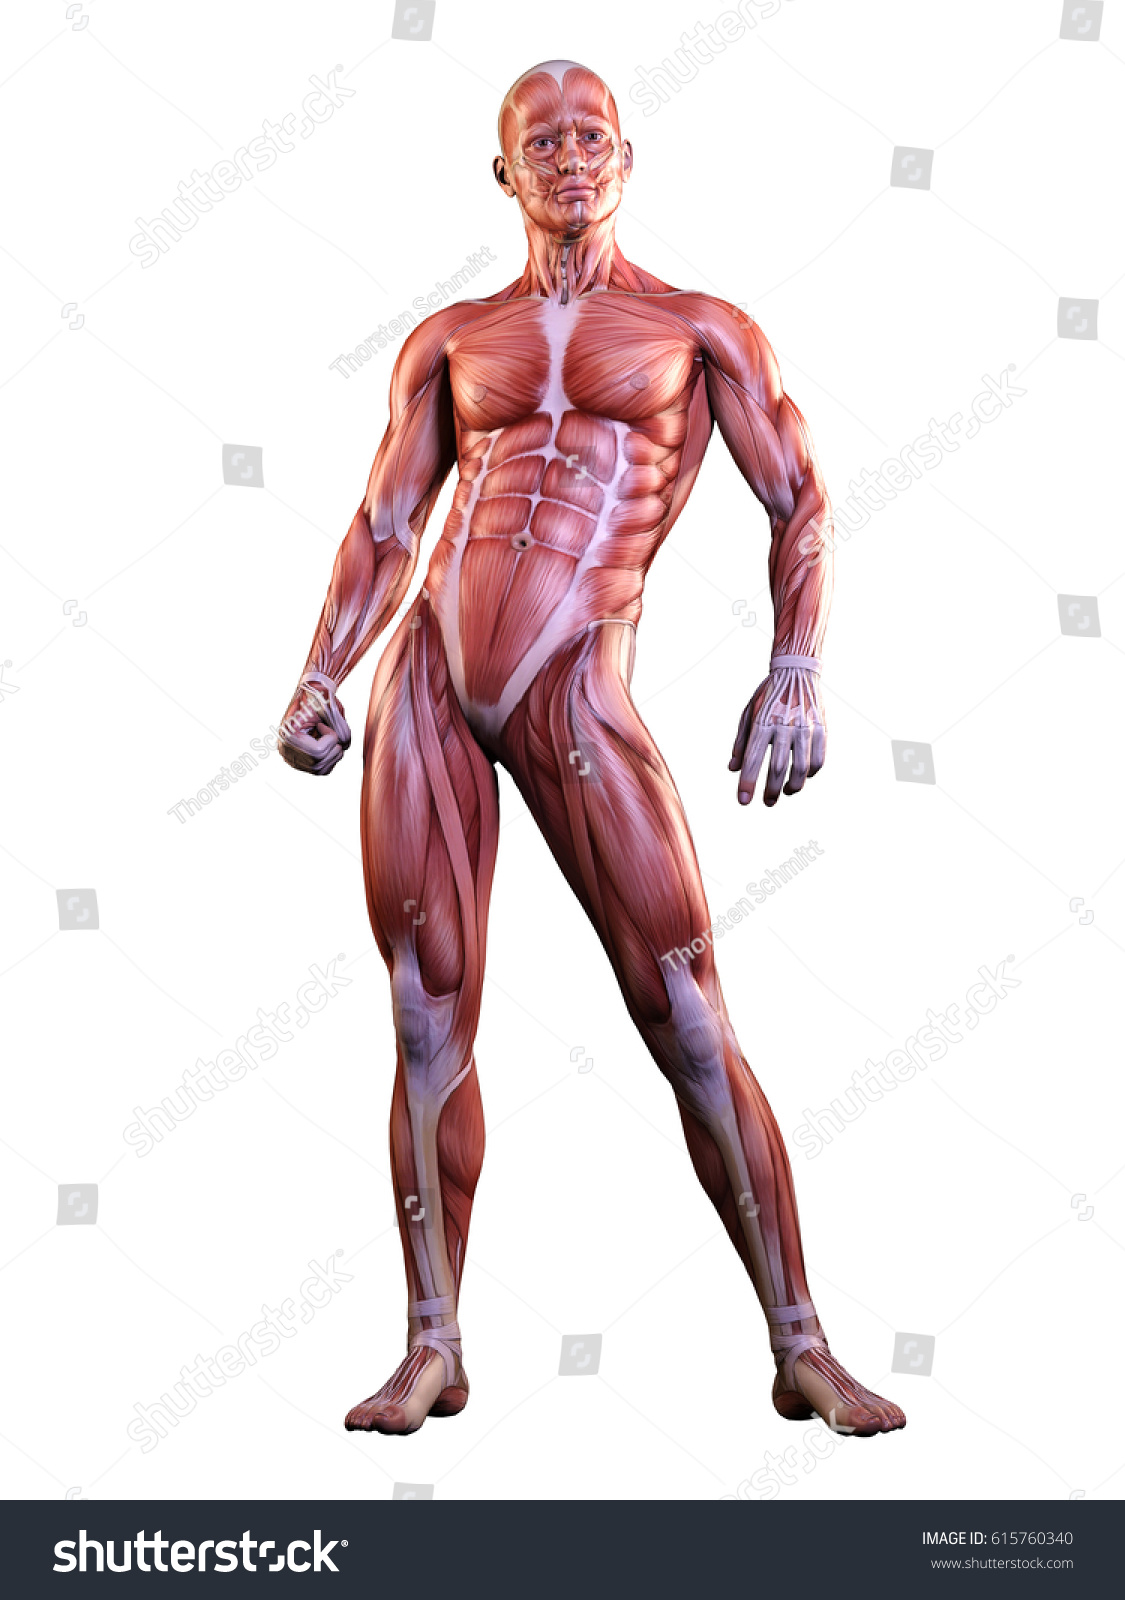 Muscle Man Anatomy Posing 3 D Illustration Stock Illustration